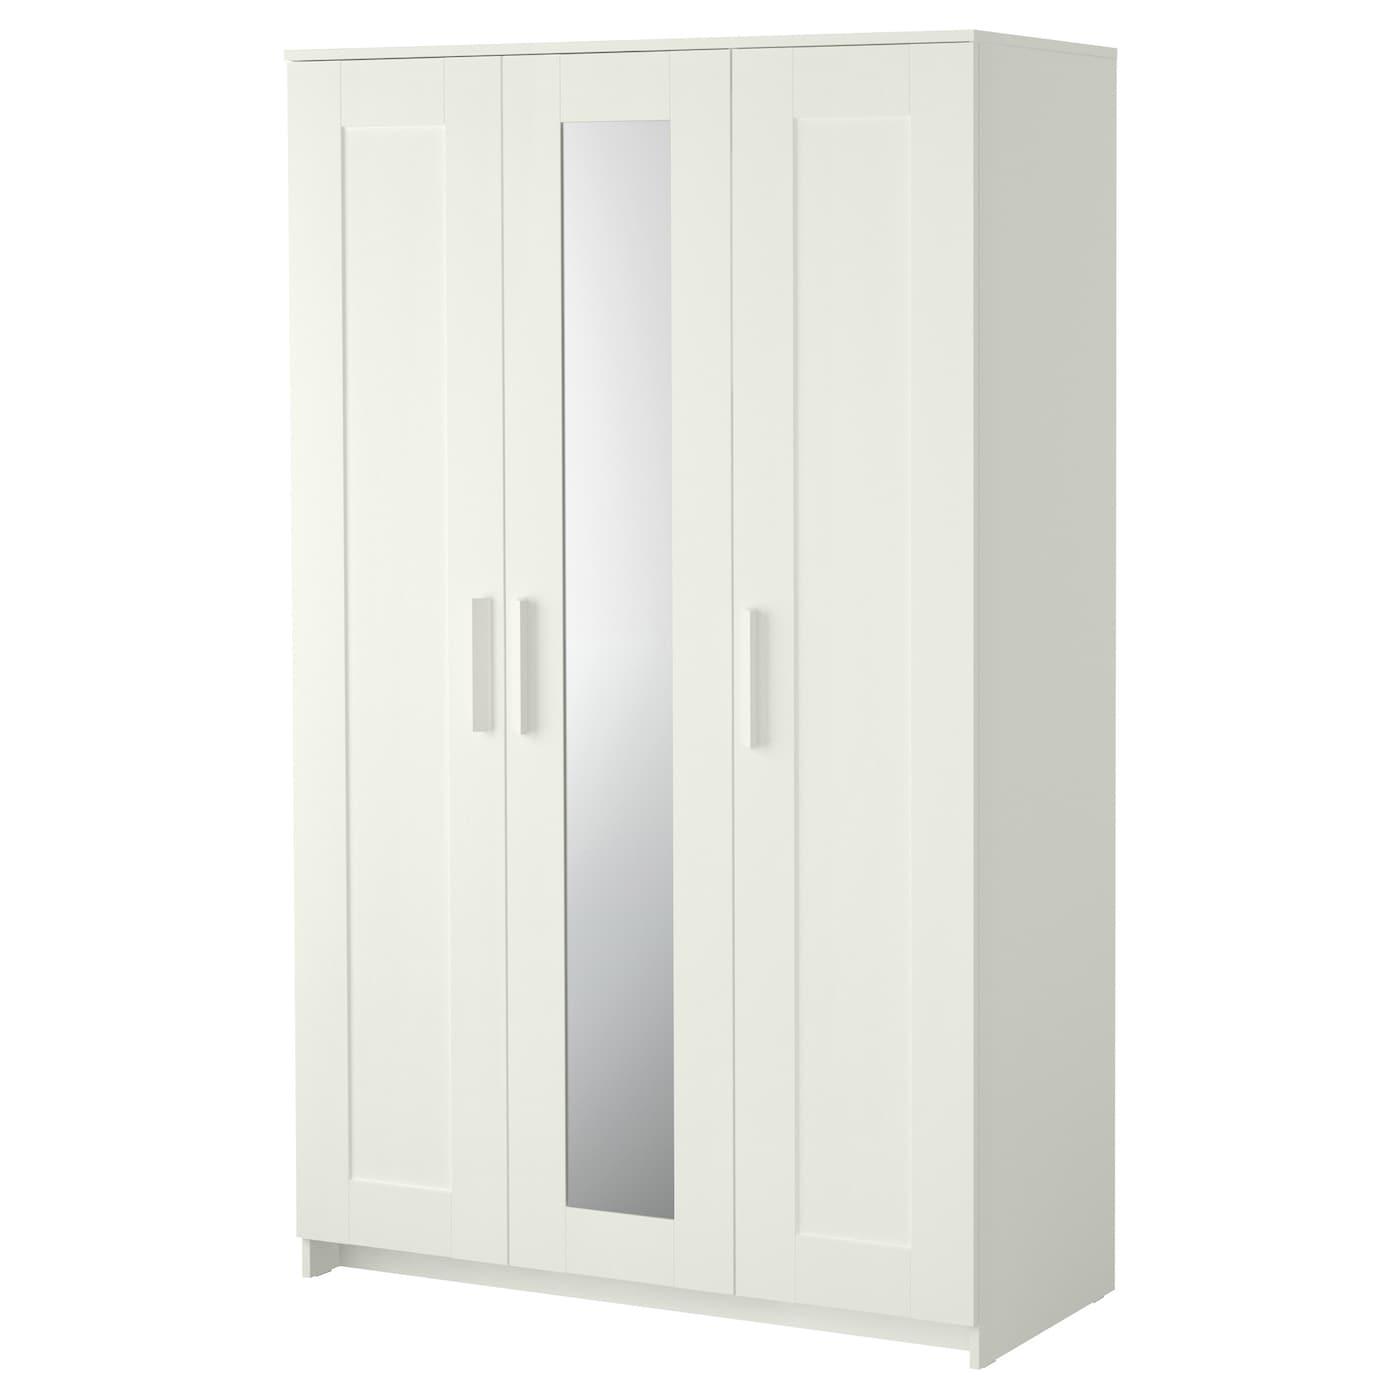 Wardrobe With 3 Doors Brimnes White